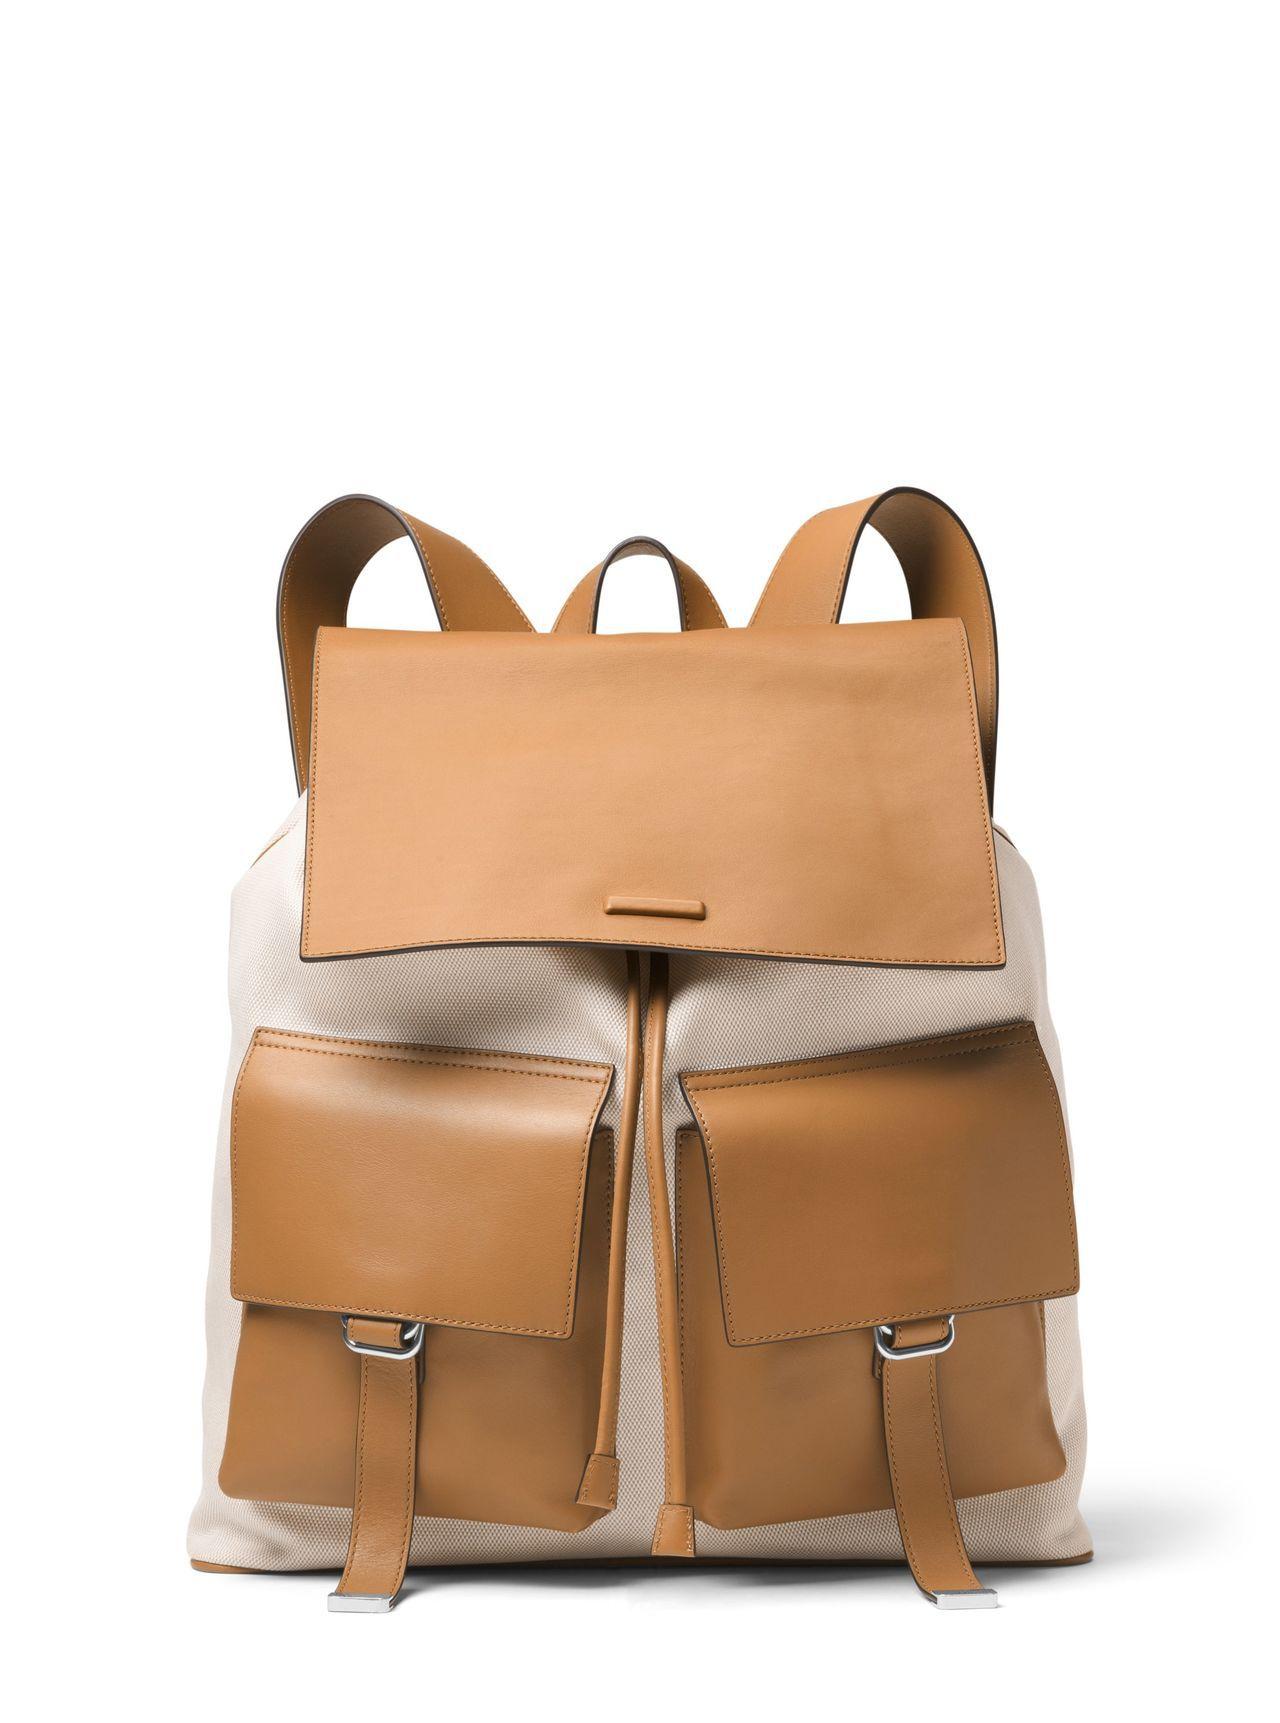 Billy駝色拼接後背包,售價46,100元。圖/MICHAEL KORS提供